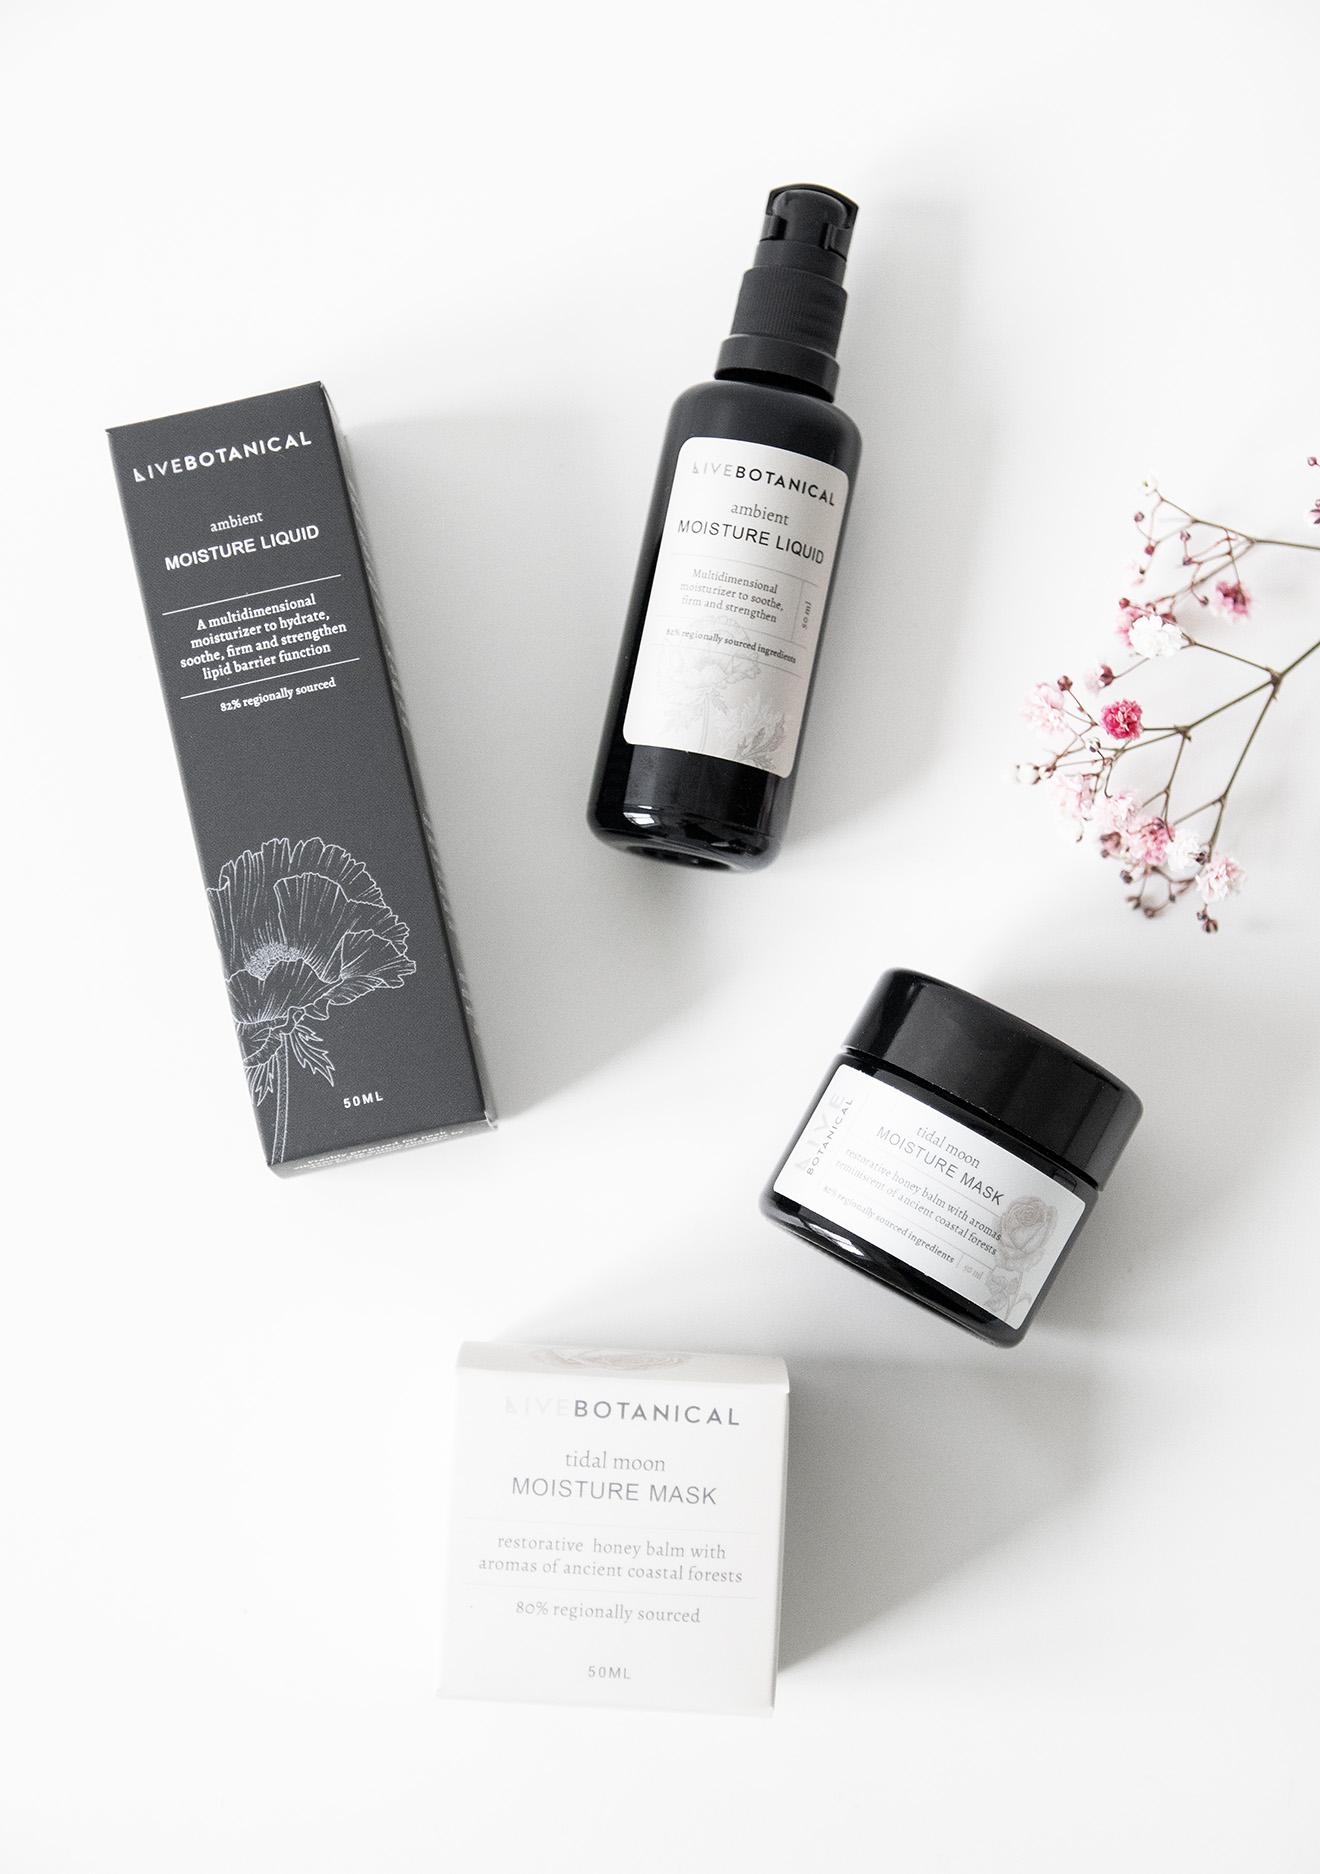 Live Botanical Moisture Liquid and Mask Organic Skincare